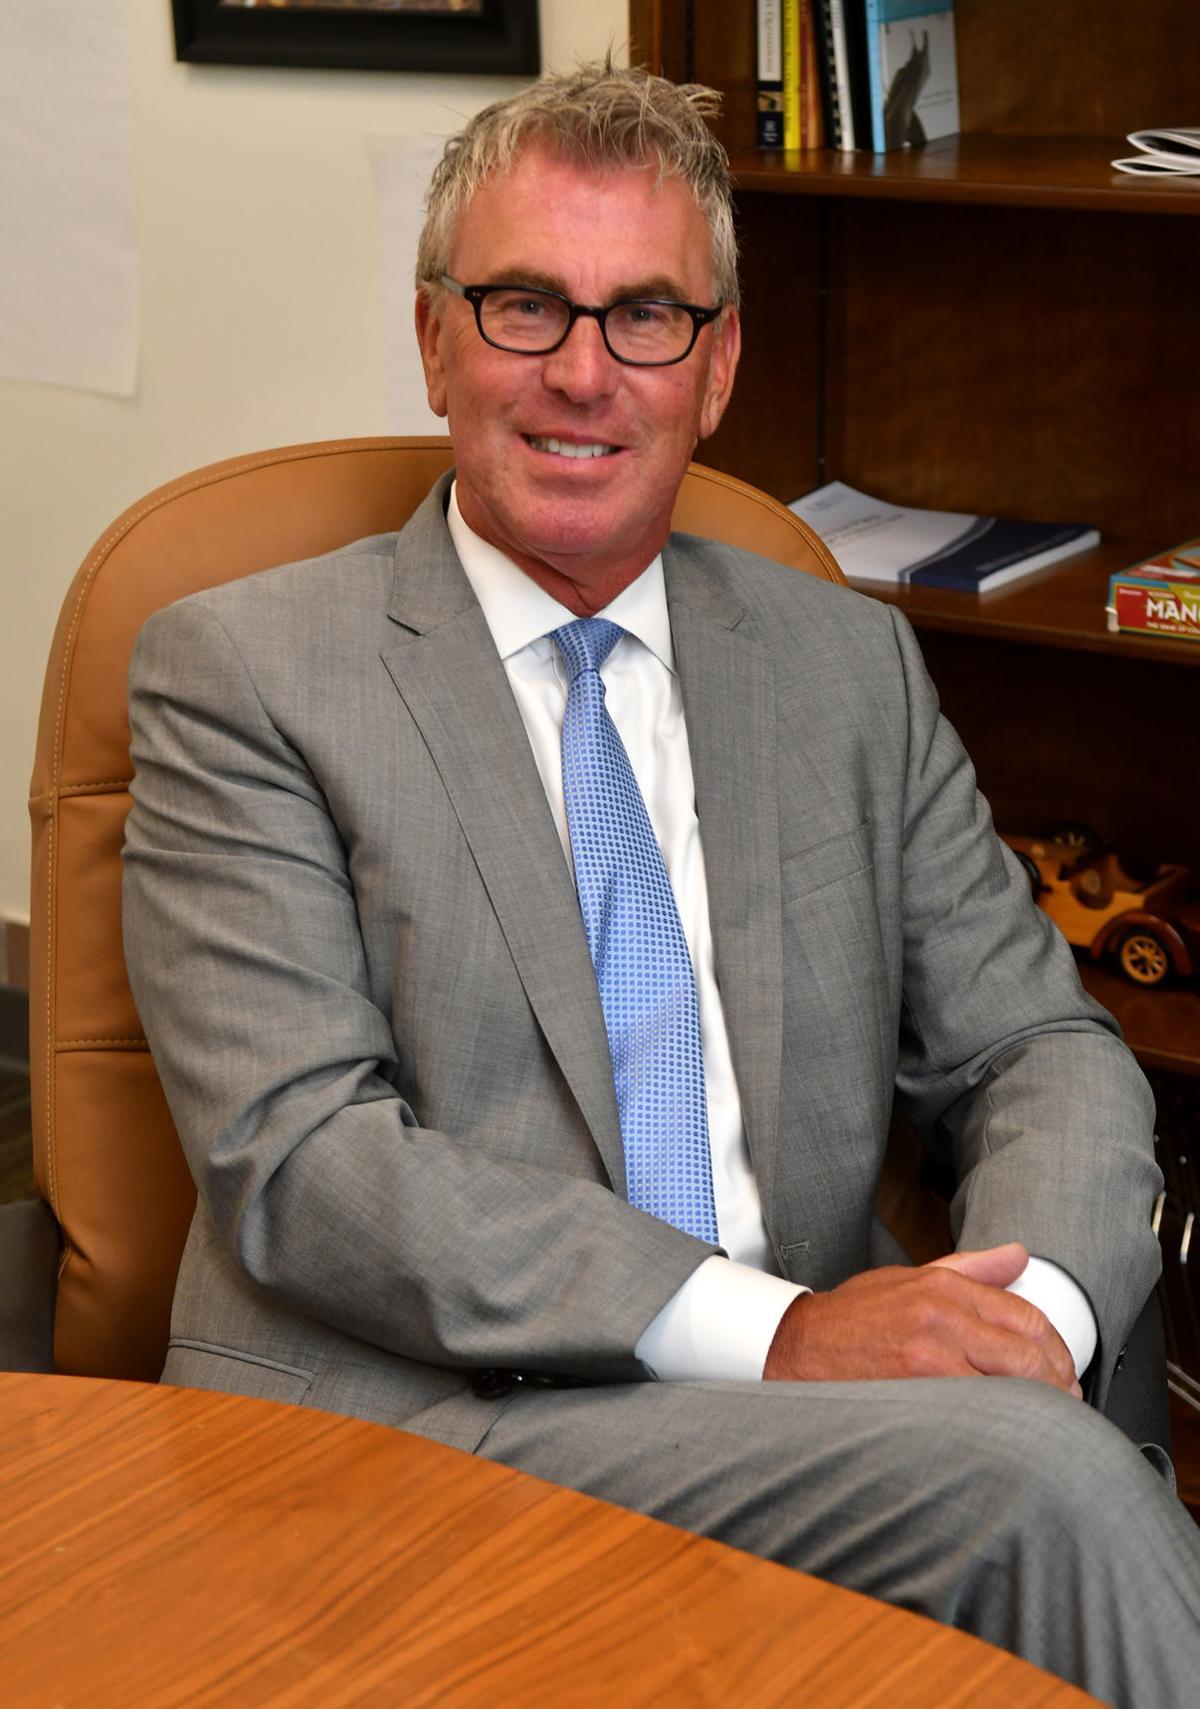 Davenport schools superintendent, Robert Kobylski